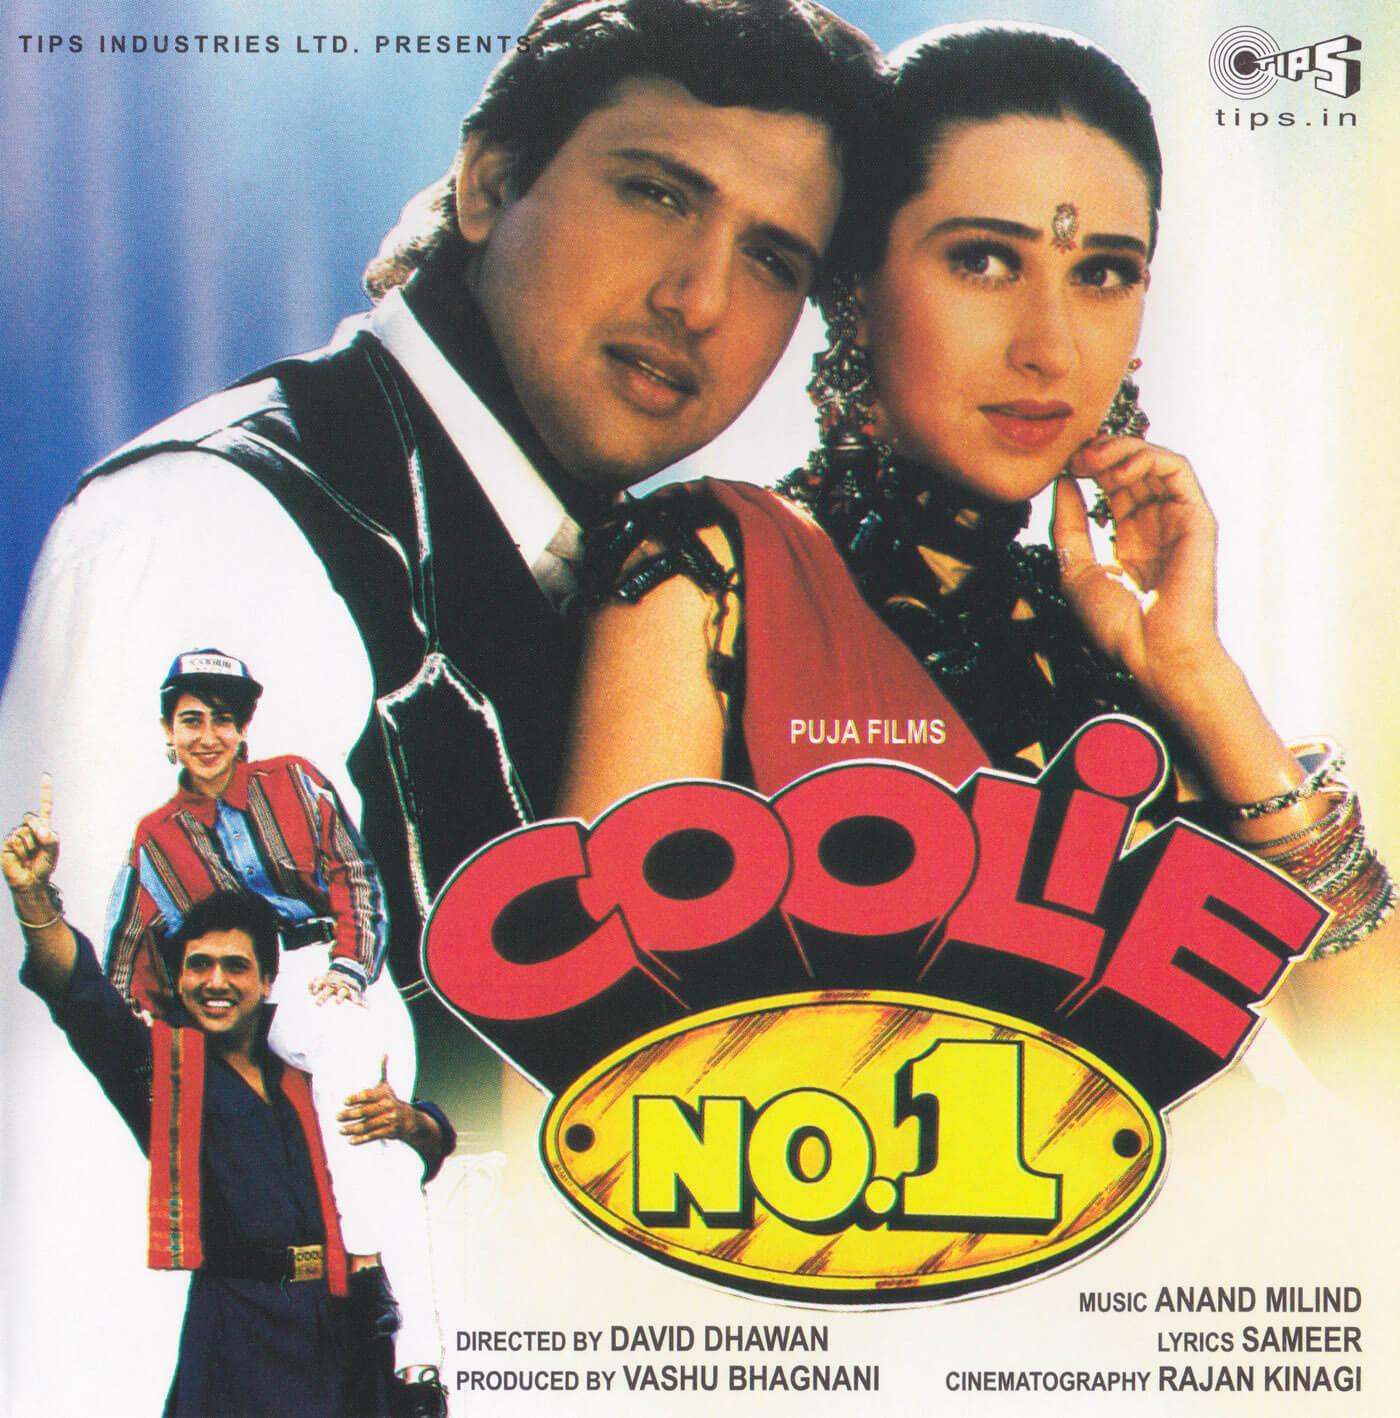 Coolie No 1 movie download